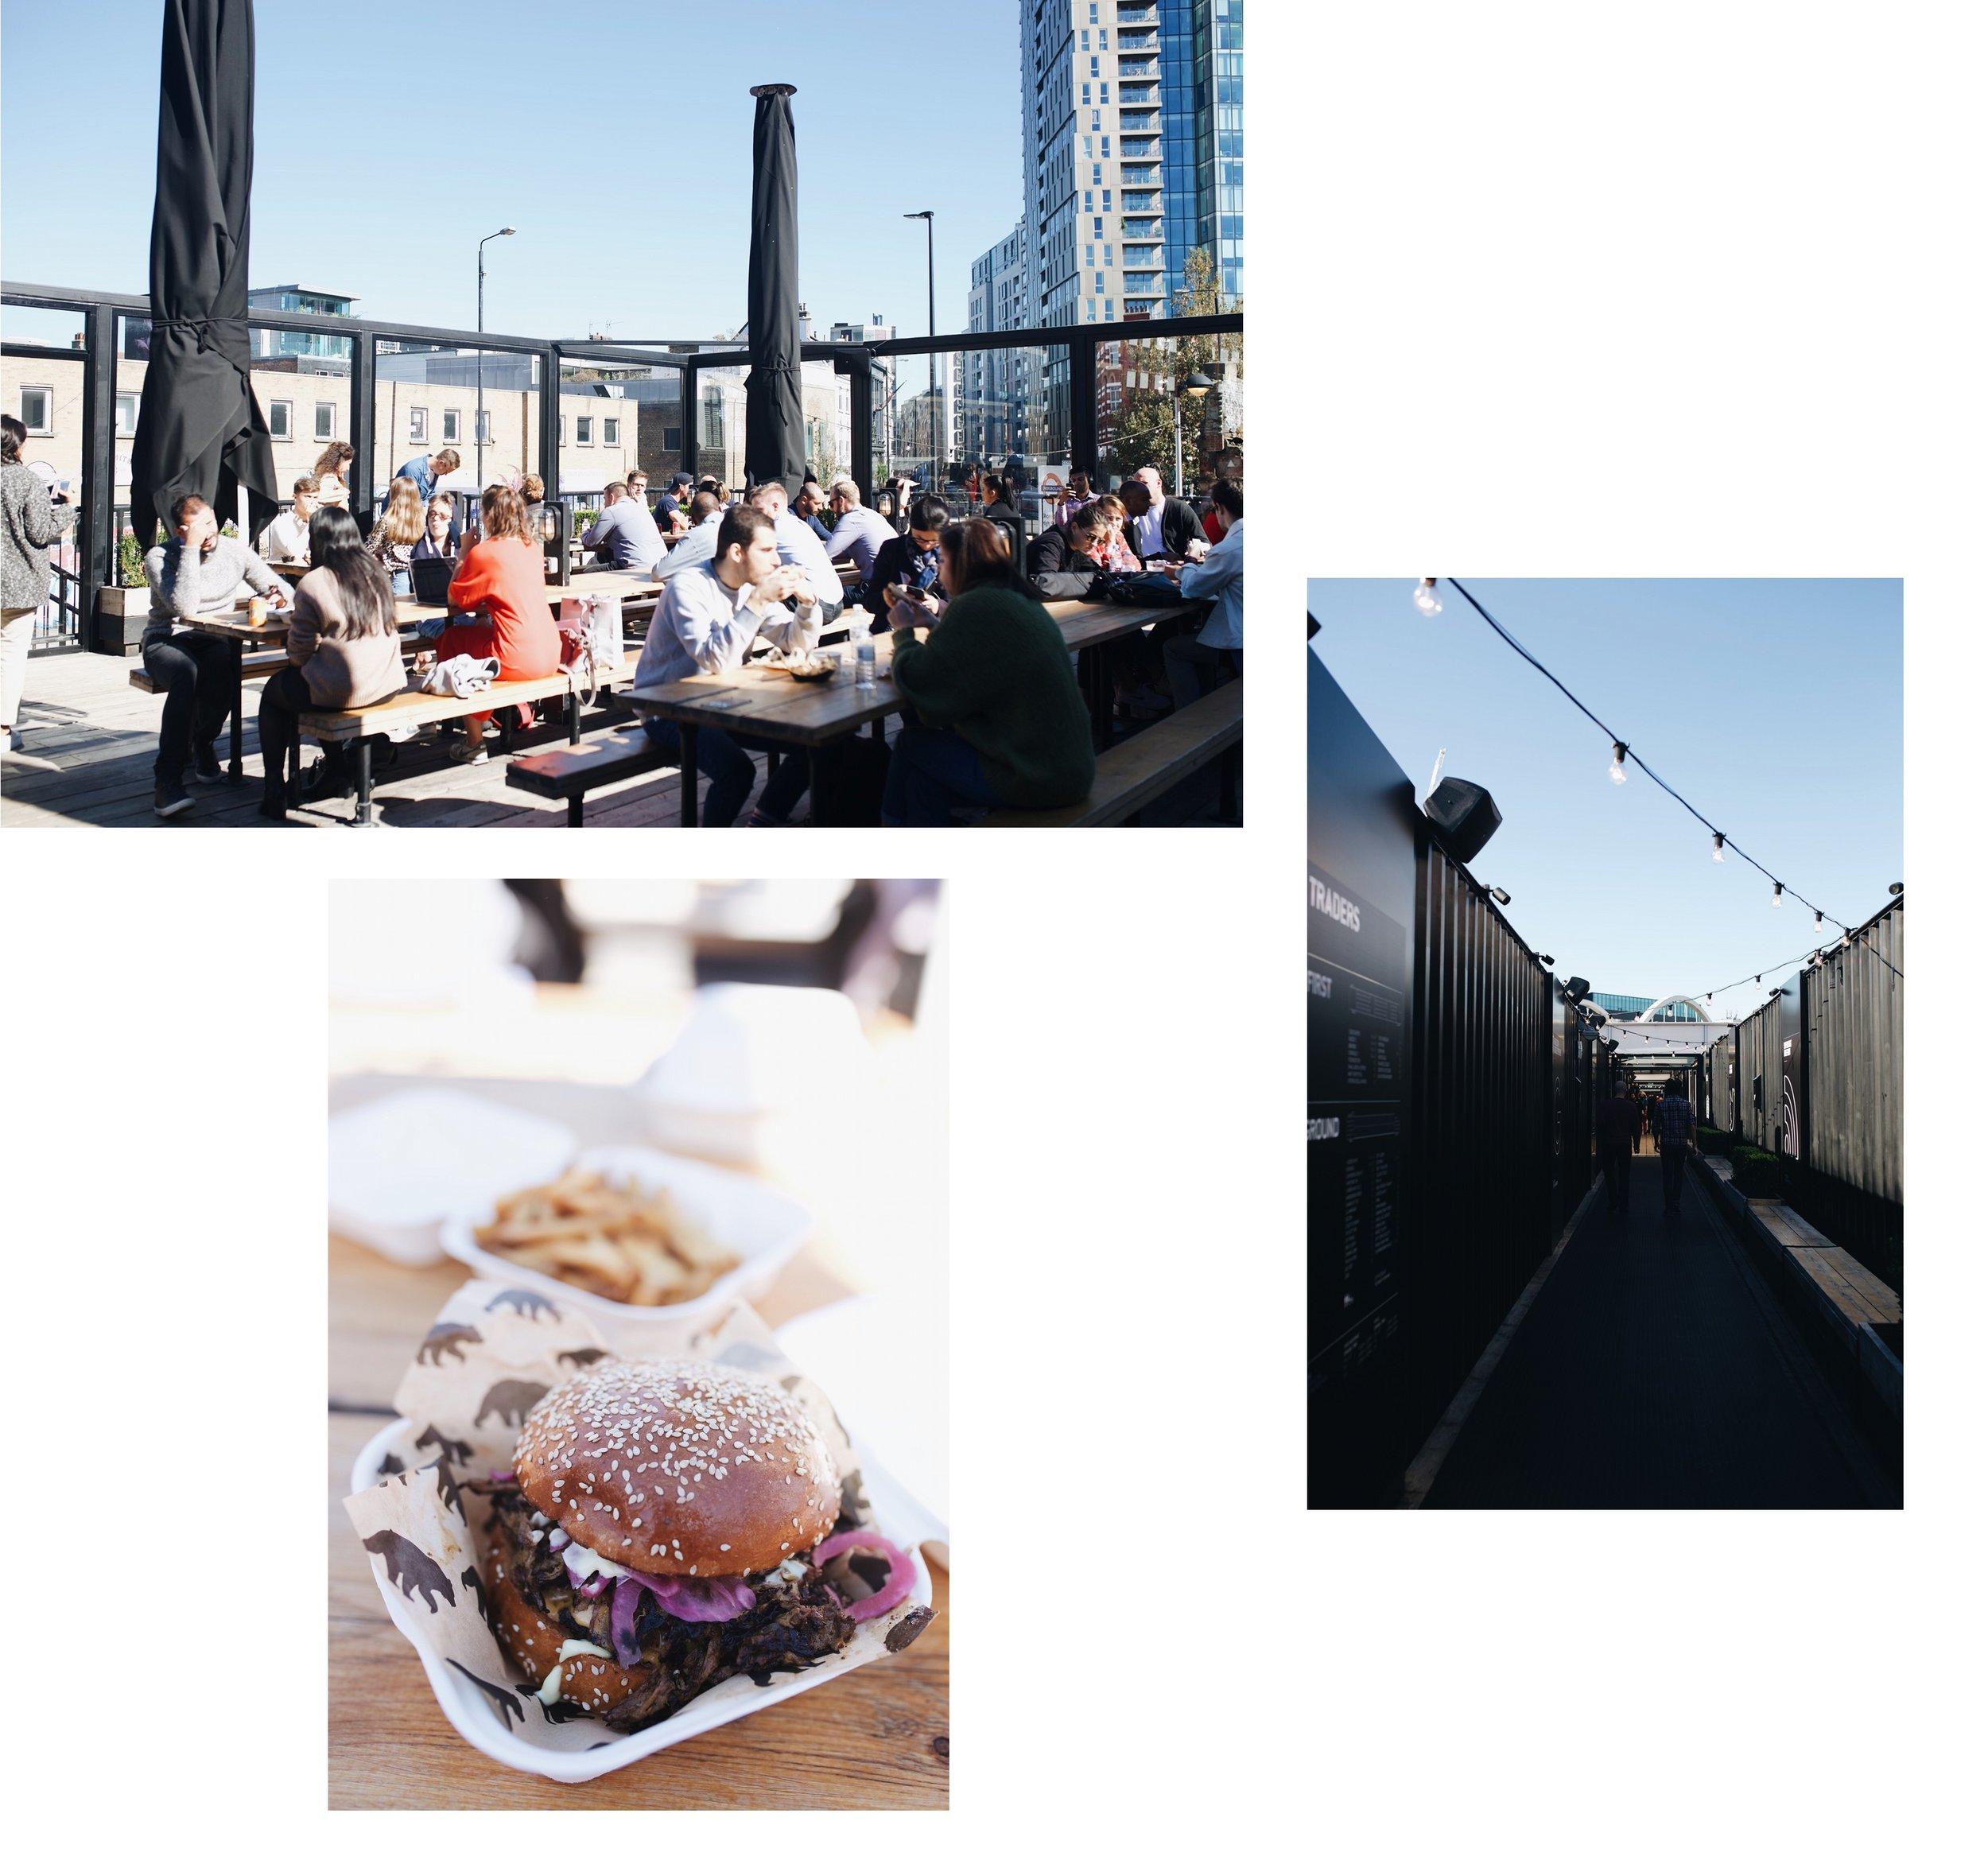 black-bear-burger-boxpark-shoreditch.jpg